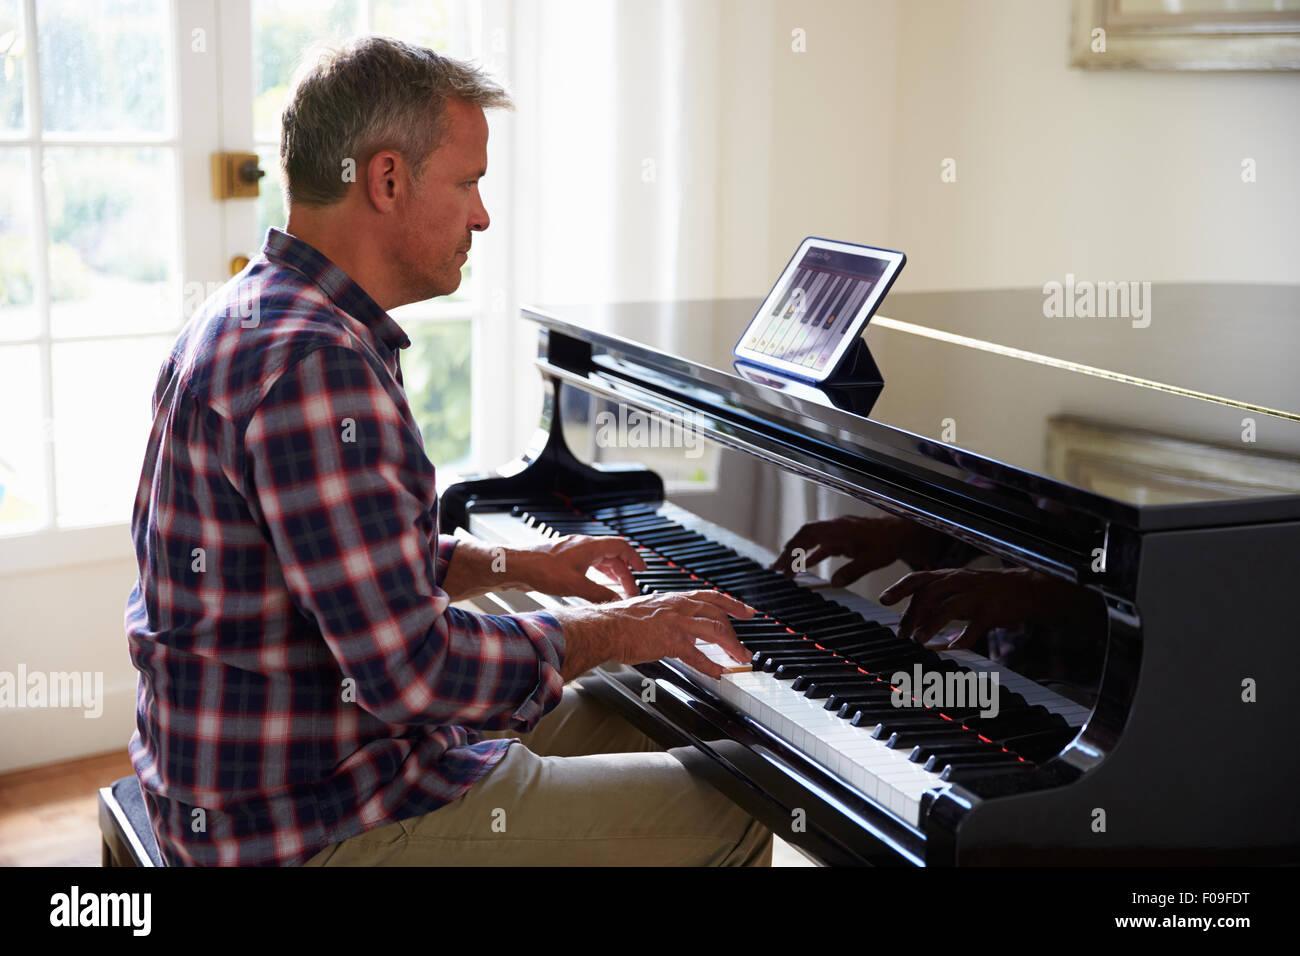 Apprendre à jouer du piano Man Using Digital Tablet Application Photo Stock